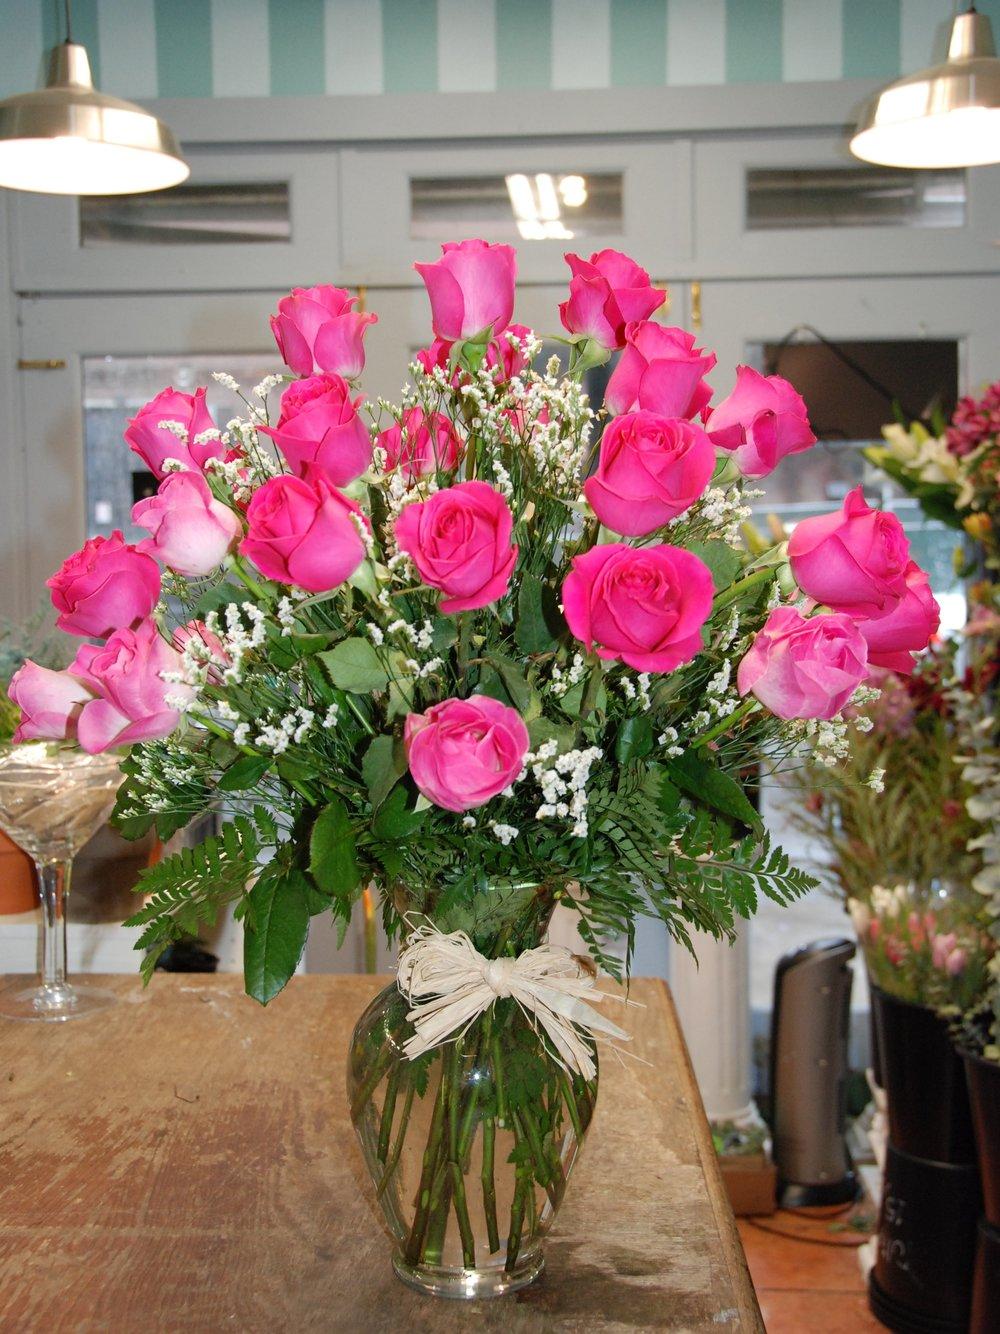 Two dozen roses vase arrangement -